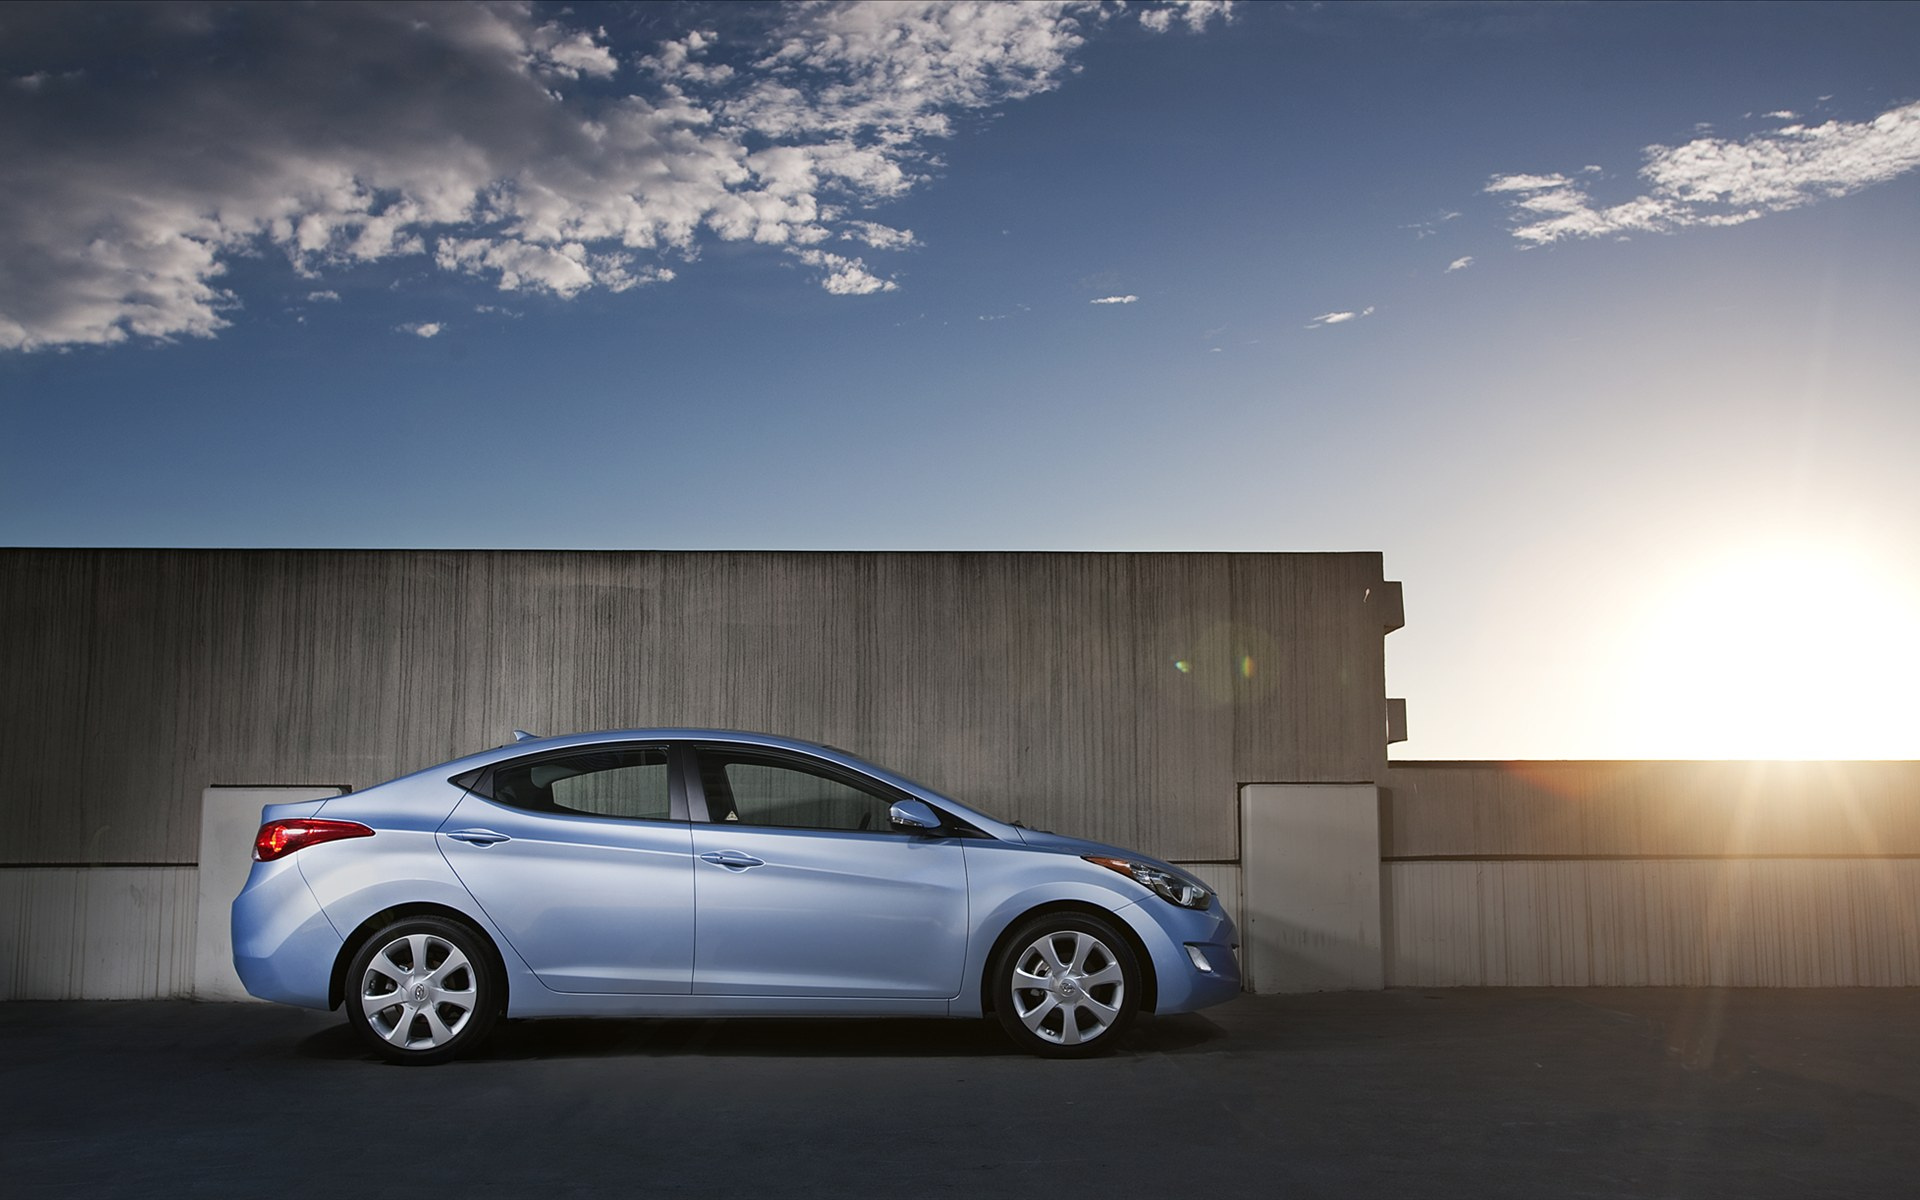 Free Hyundai Wallpaper